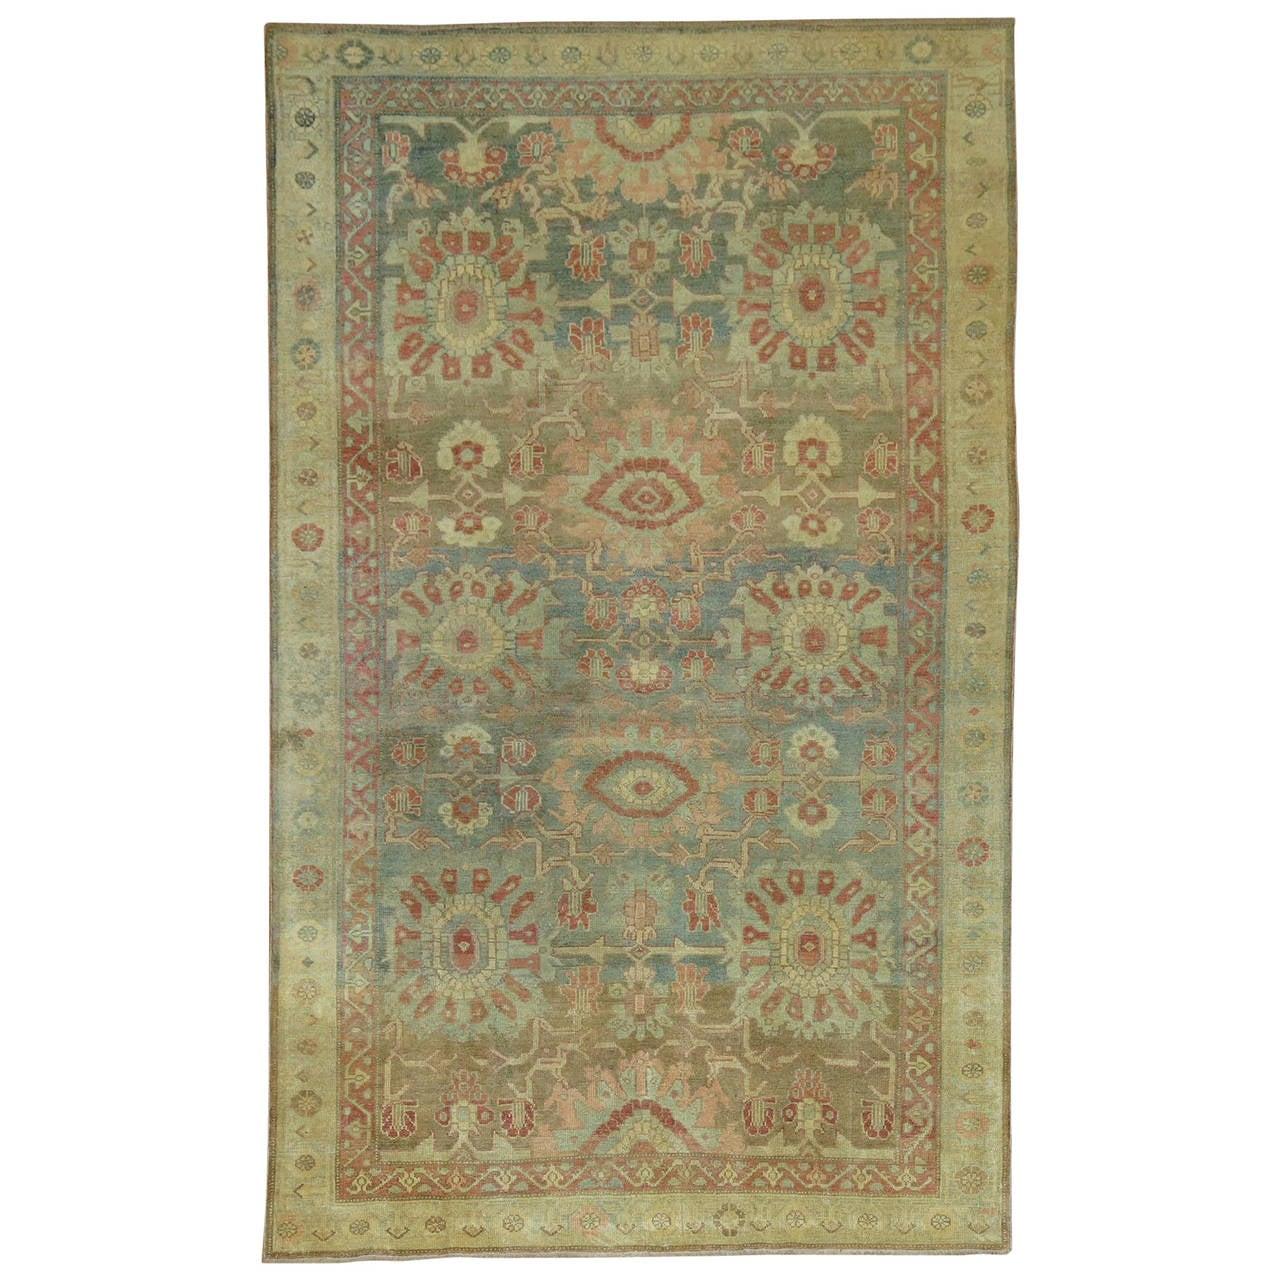 Antique Persian Malayer 1